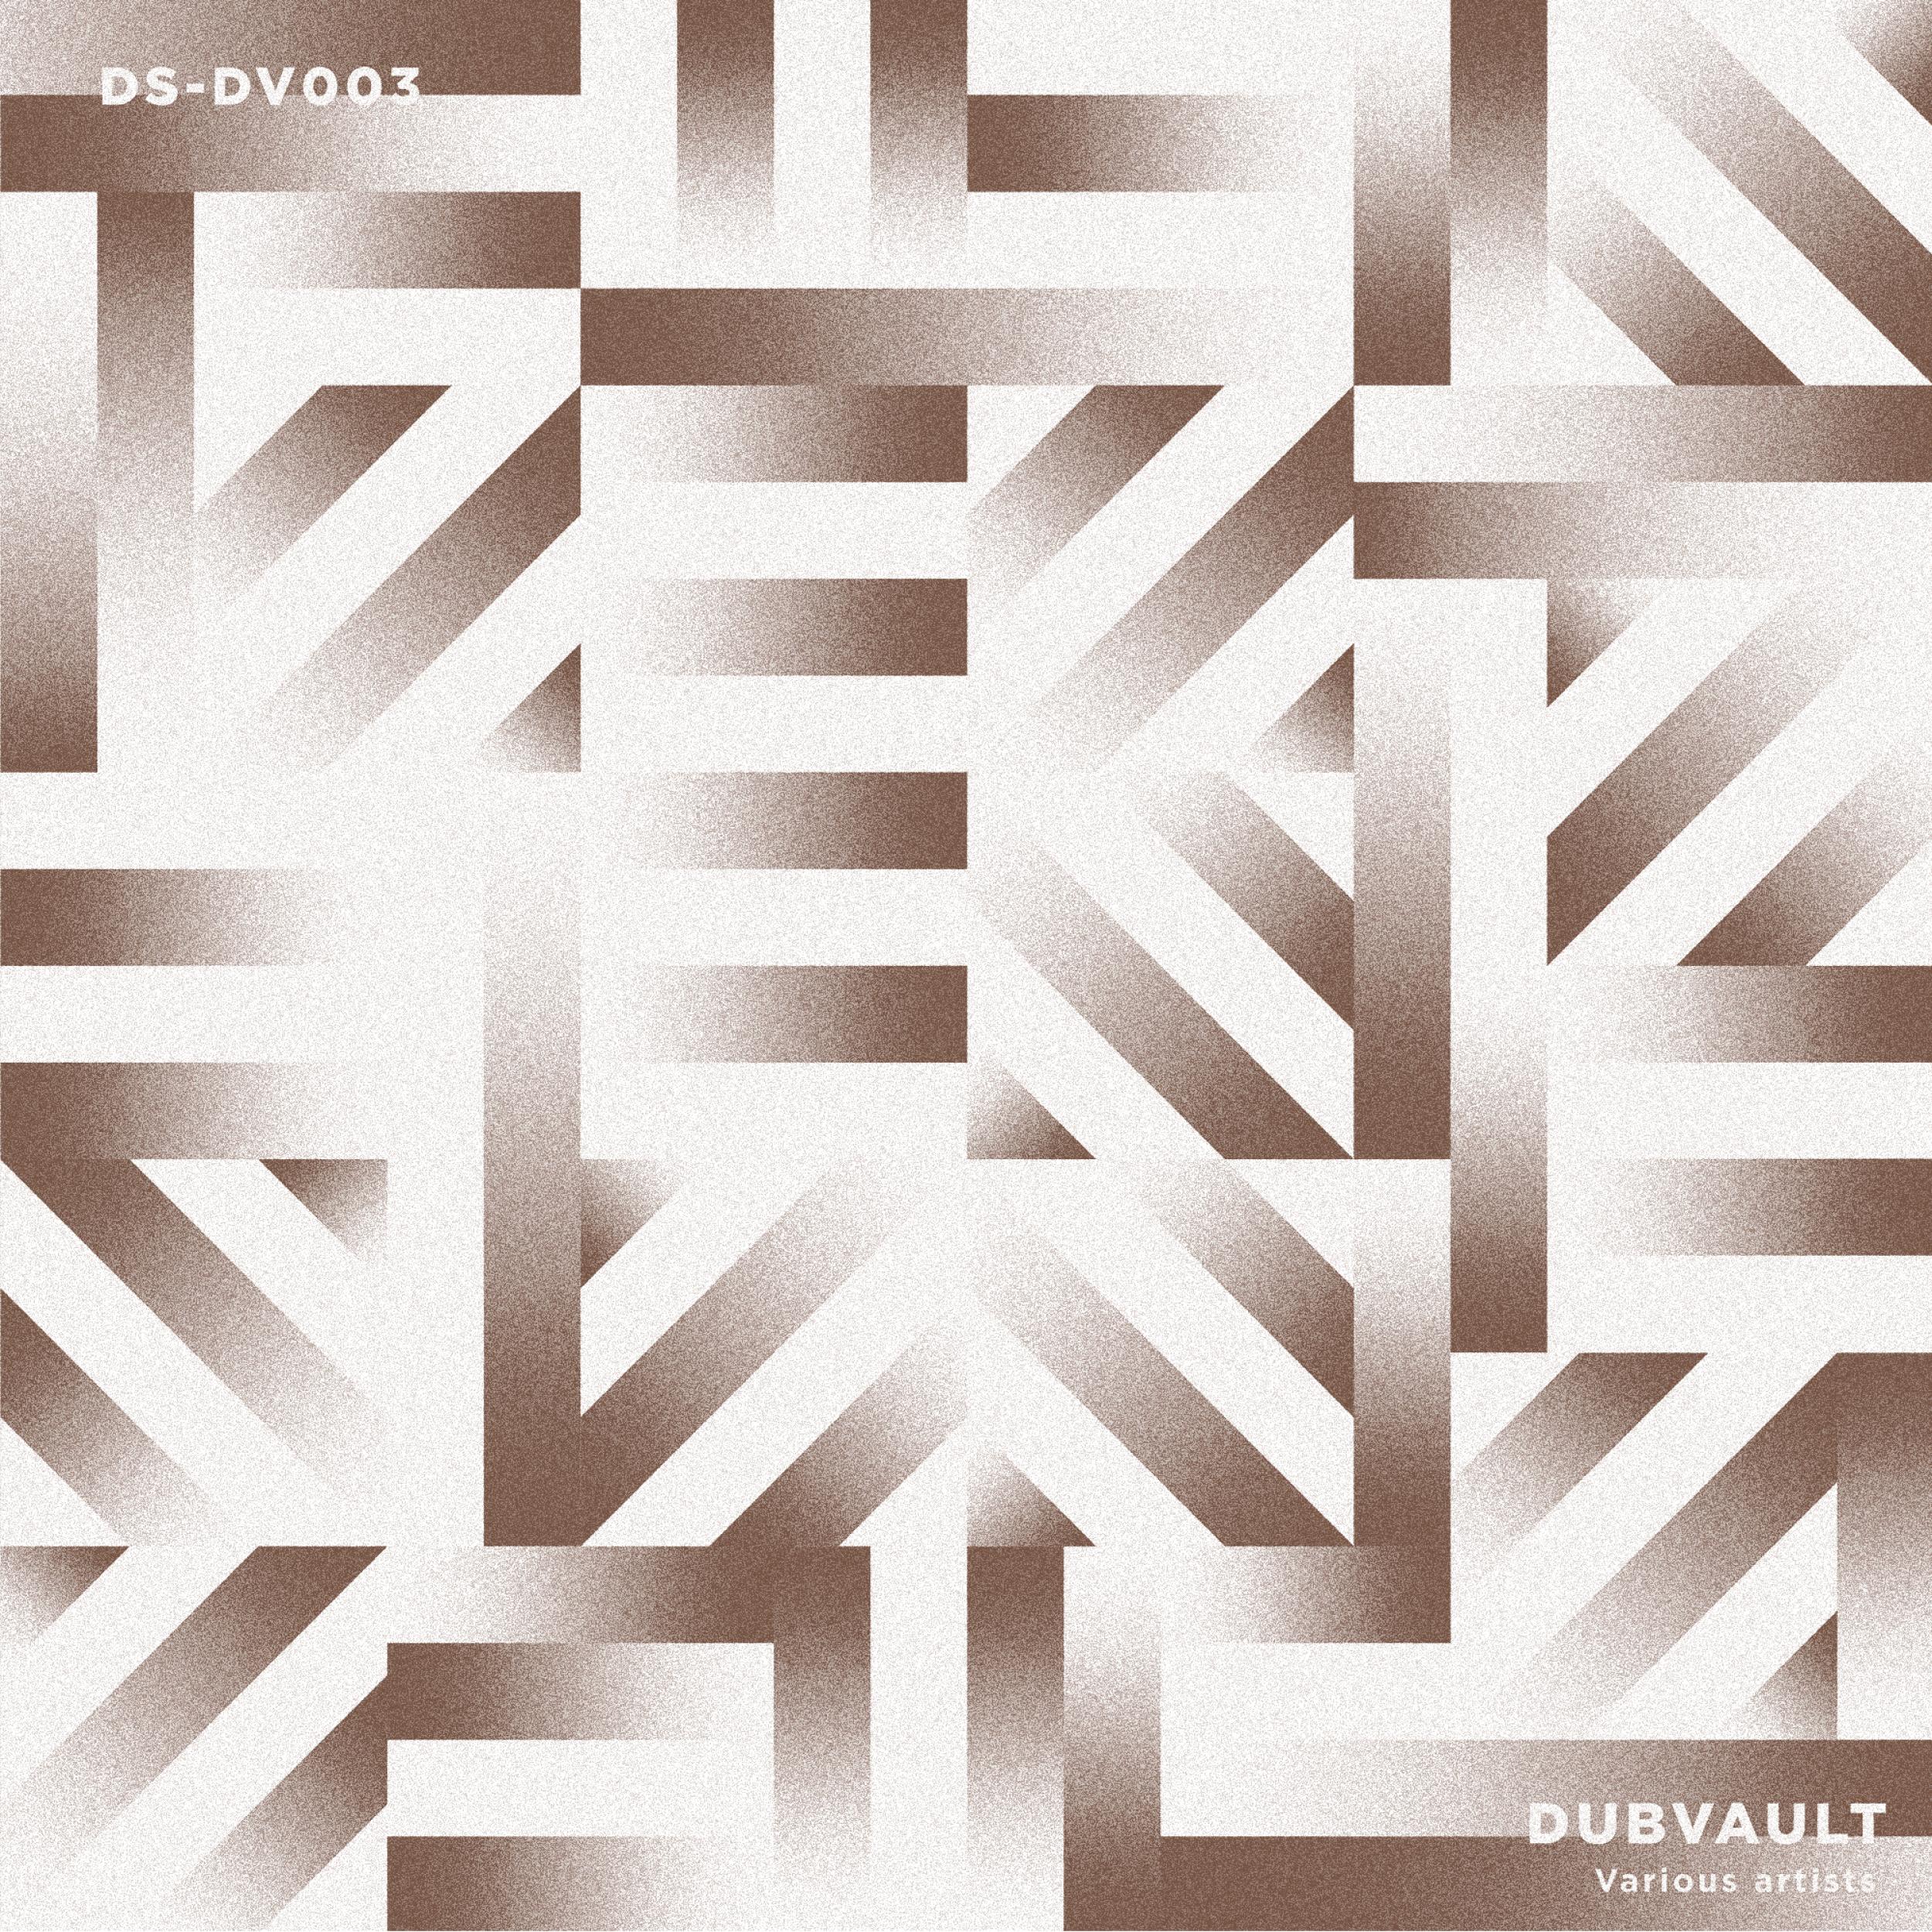 Dub-Stuy Presents Dubvault Volume 3